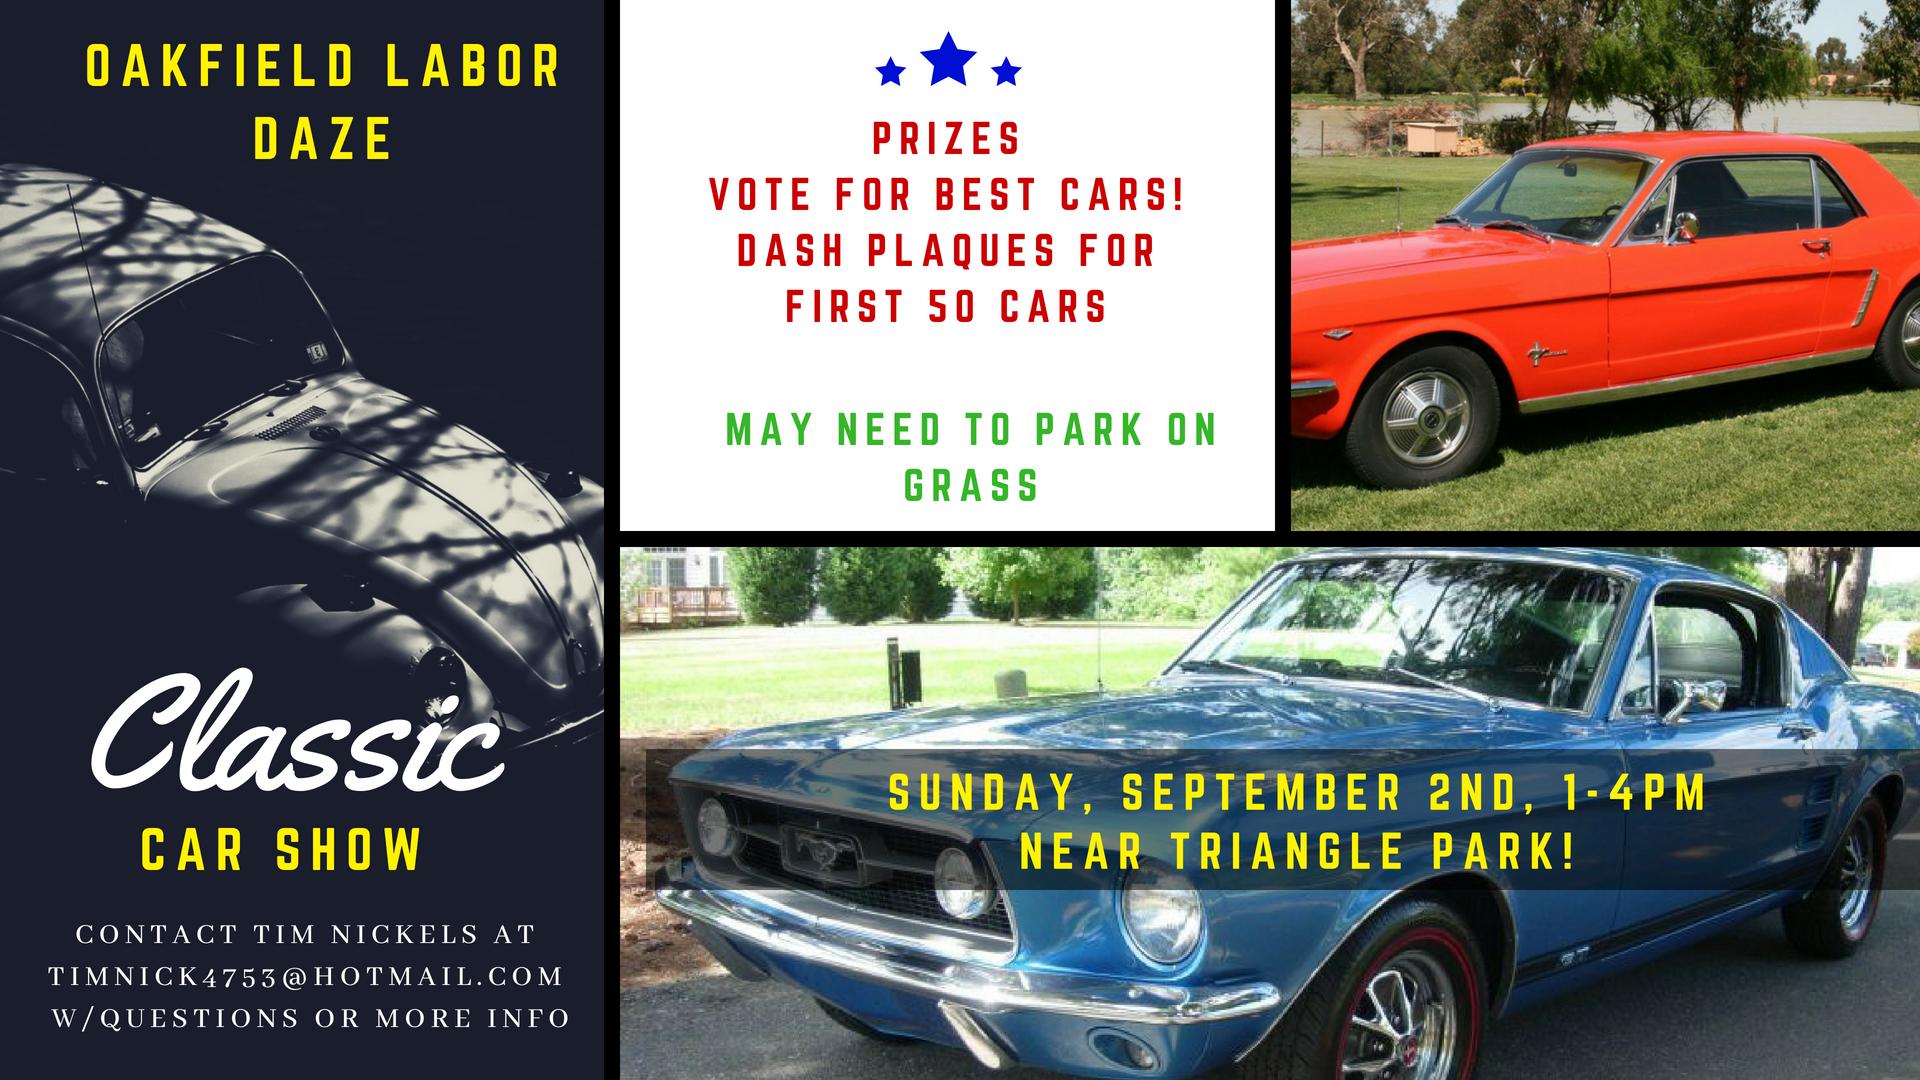 Oakfield Labor Daze Classic Car Show Apex Automotive Magazine - Classic car shows near me 2018